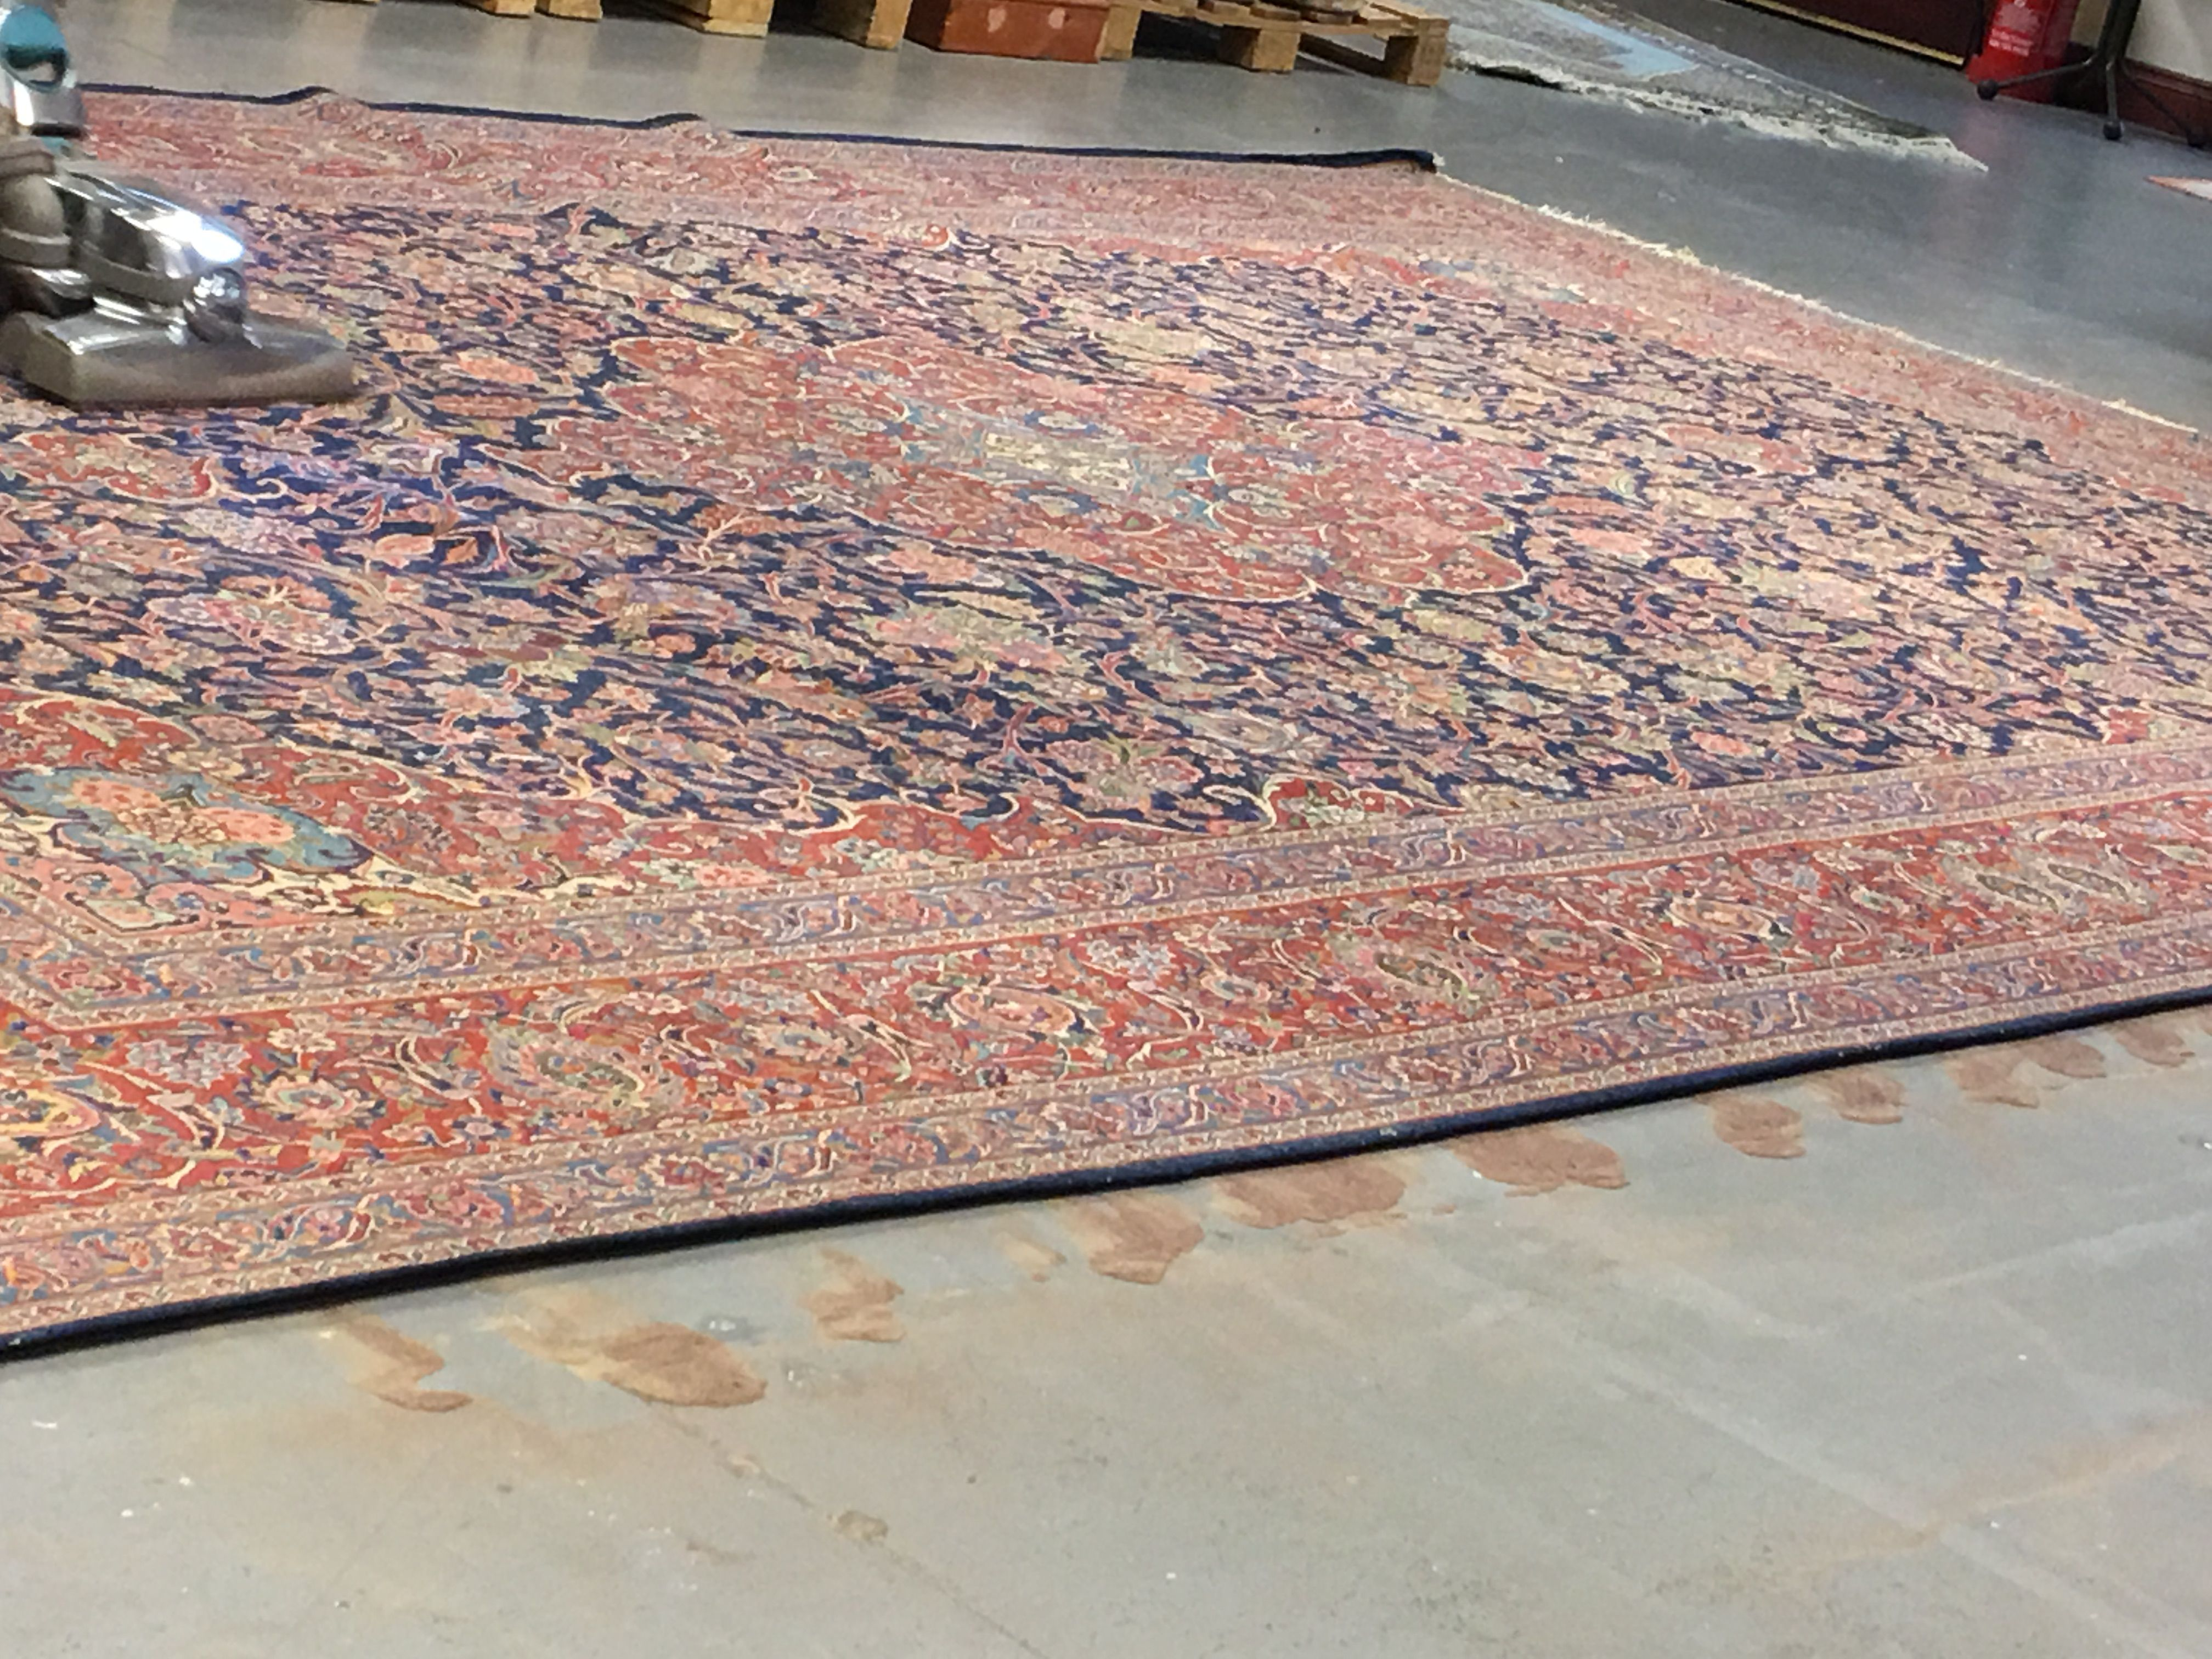 Best Value Oriental Carpets and Rugs services. With over 30 years of experience    #orientalrugservicesltd #rugrestorer #rugrestoration #carpetcleaning #rugcleaning #carpetrestoration #rugvaluations #rugvalue #carpetvaluations #antiquerugcleaning #antiquecarpetcleaning #antiquecarpetspacialist #carpets #rugs #rugandcarpet #carpetandrug #restoration